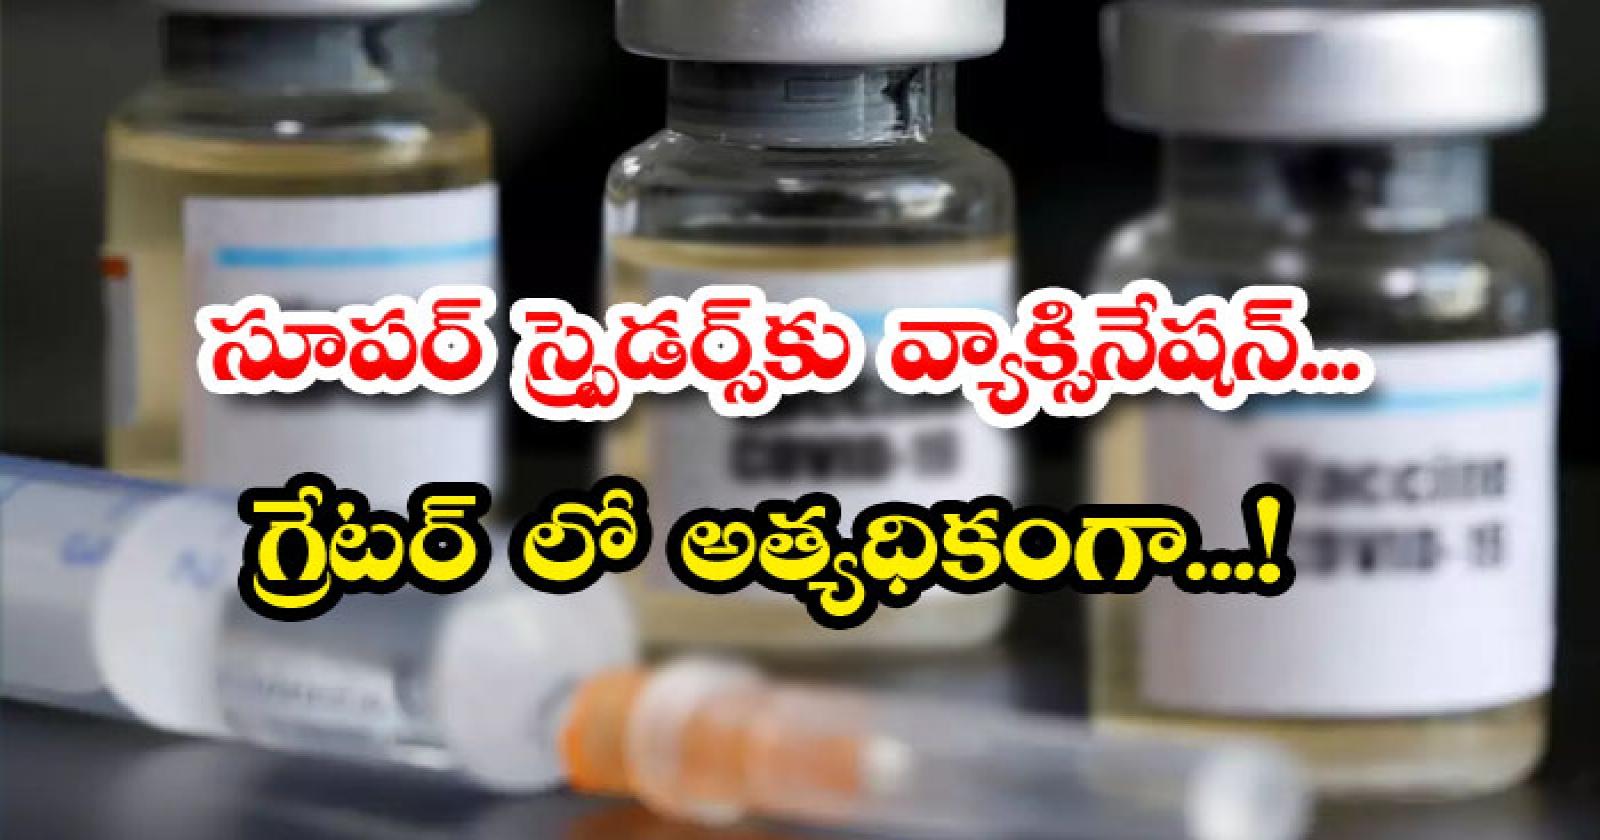 Special Covid Vaccination Drive Super Spreaders In Telangana-సూపర్ స్ప్రెడర్స్ కు వ్యాక్సినేషన్.. గ్రేటర్ లో అత్యధికంగా..-Breaking/Featured News Slide-Telugu Tollywood Photo Image-TeluguStop.com